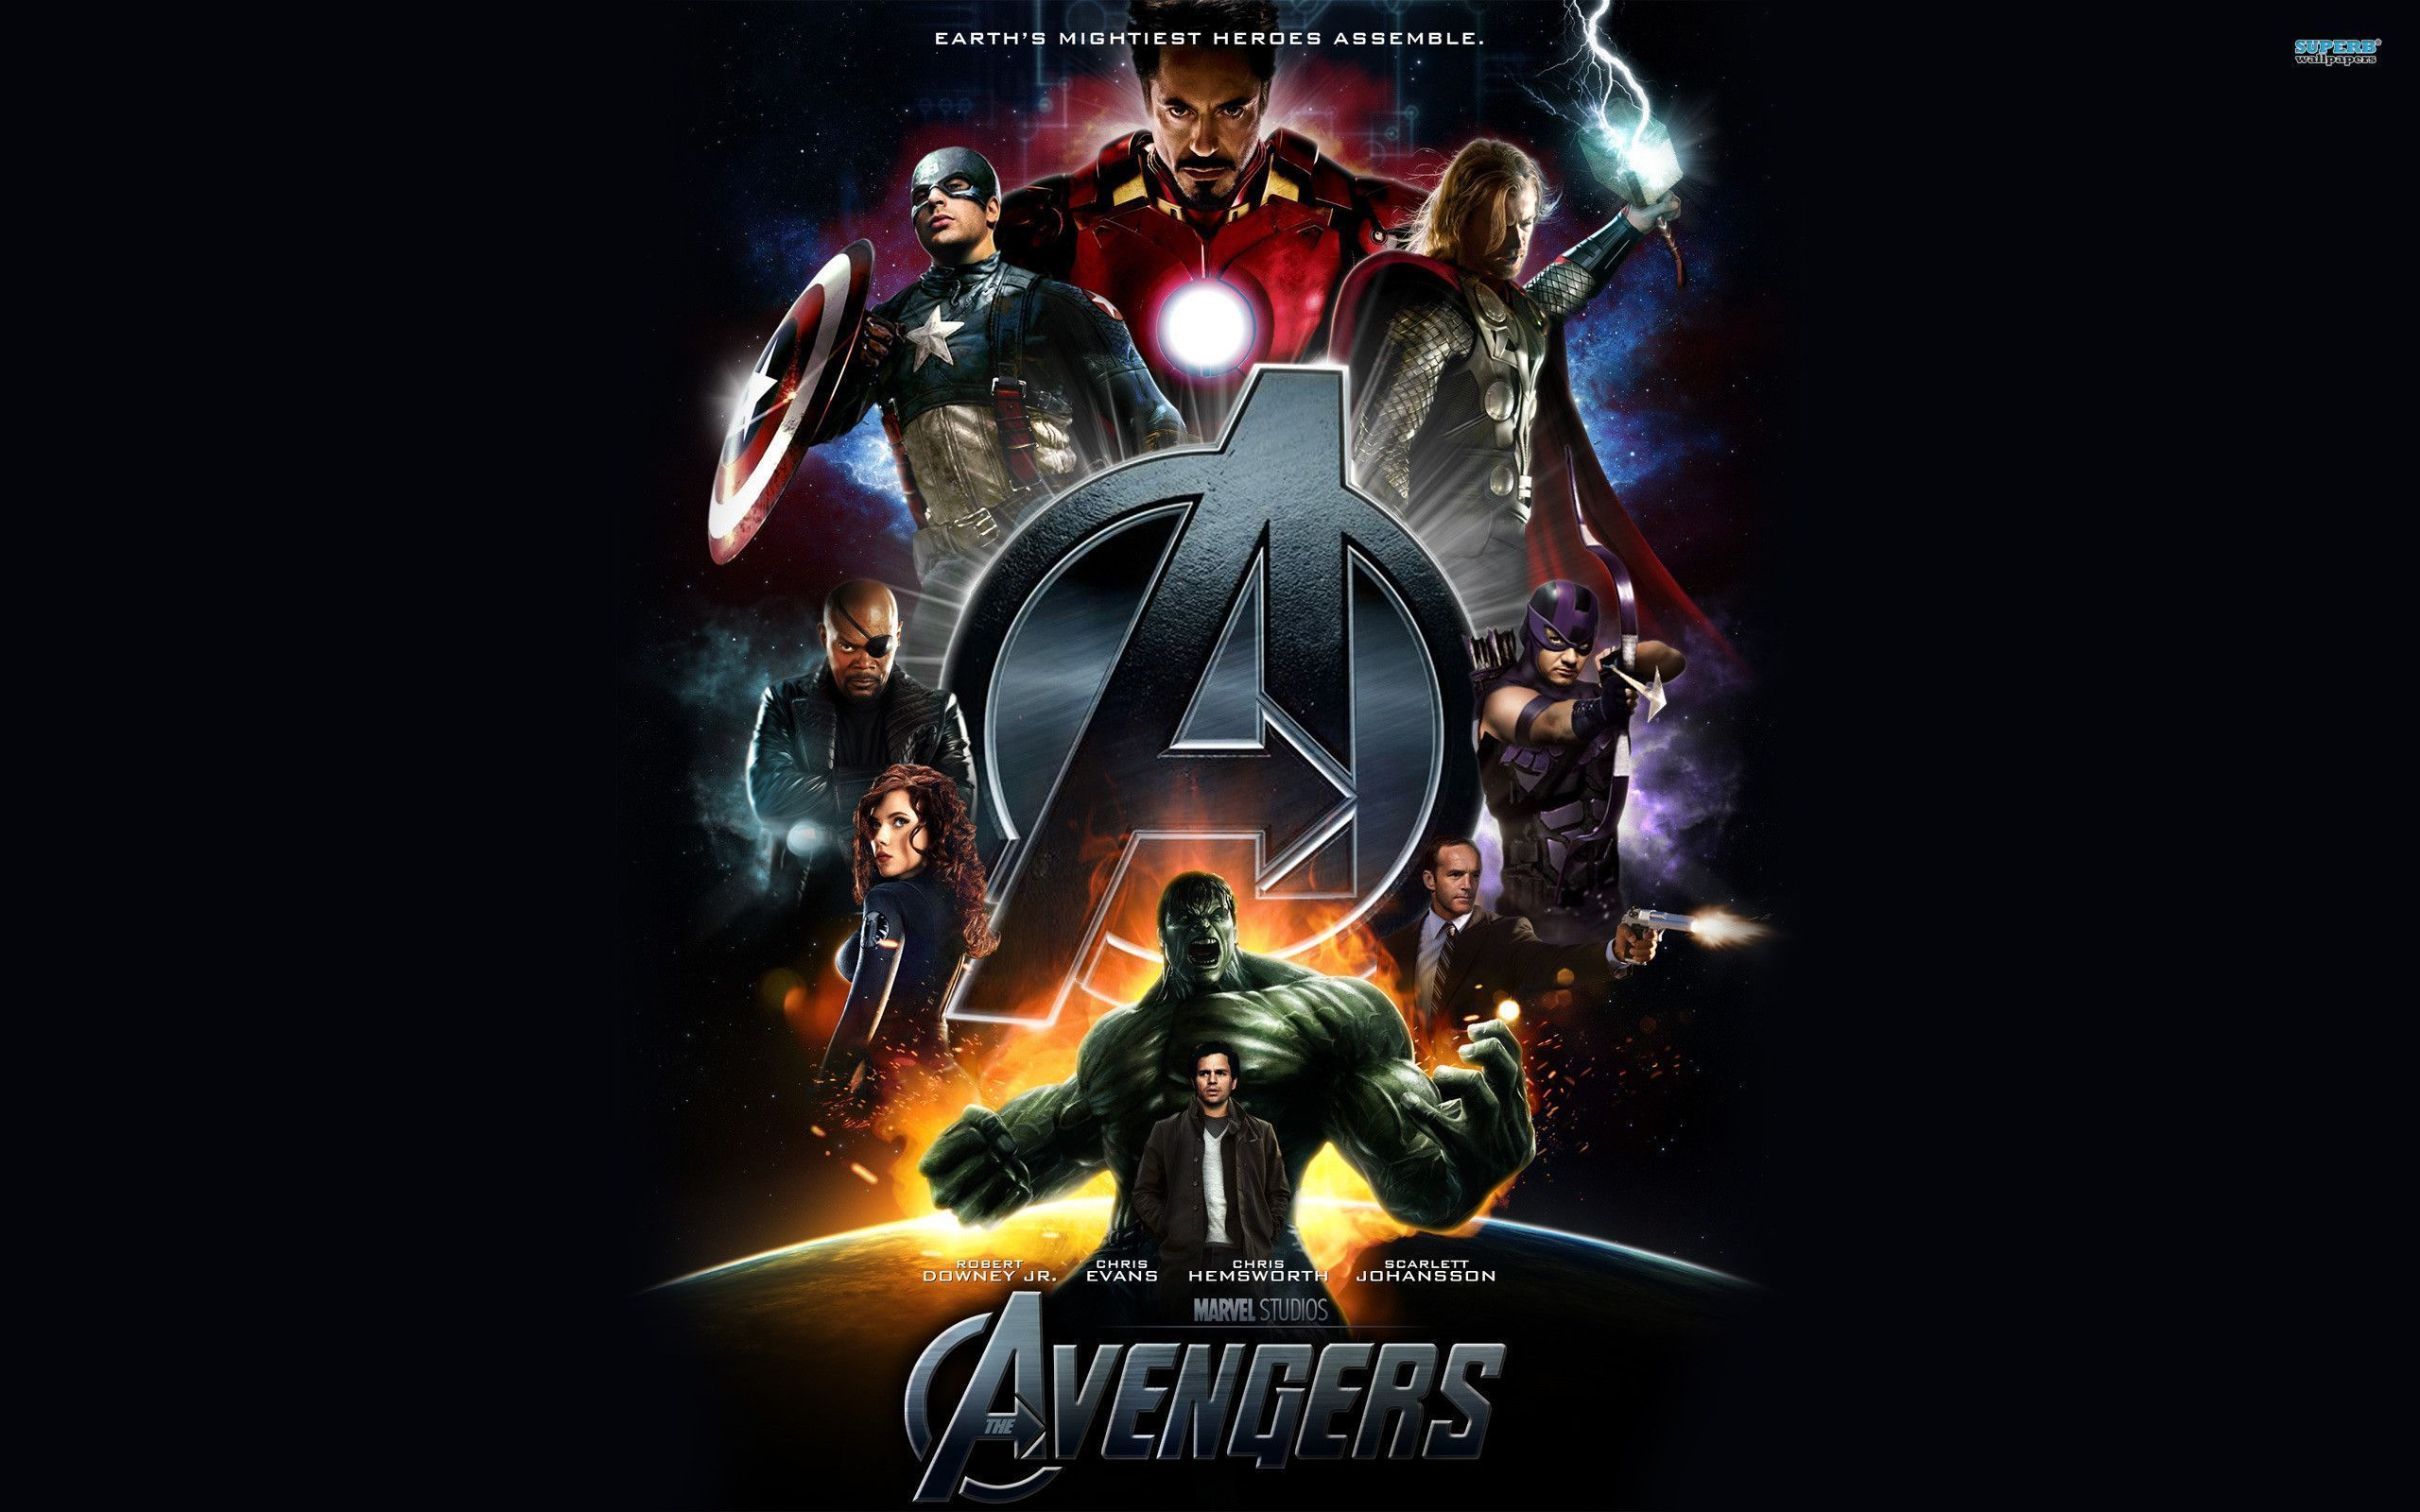 Avengers Wallpapers Hd Wallpaper Cave Avengers Wallpaper Iron Man Movie Avengers